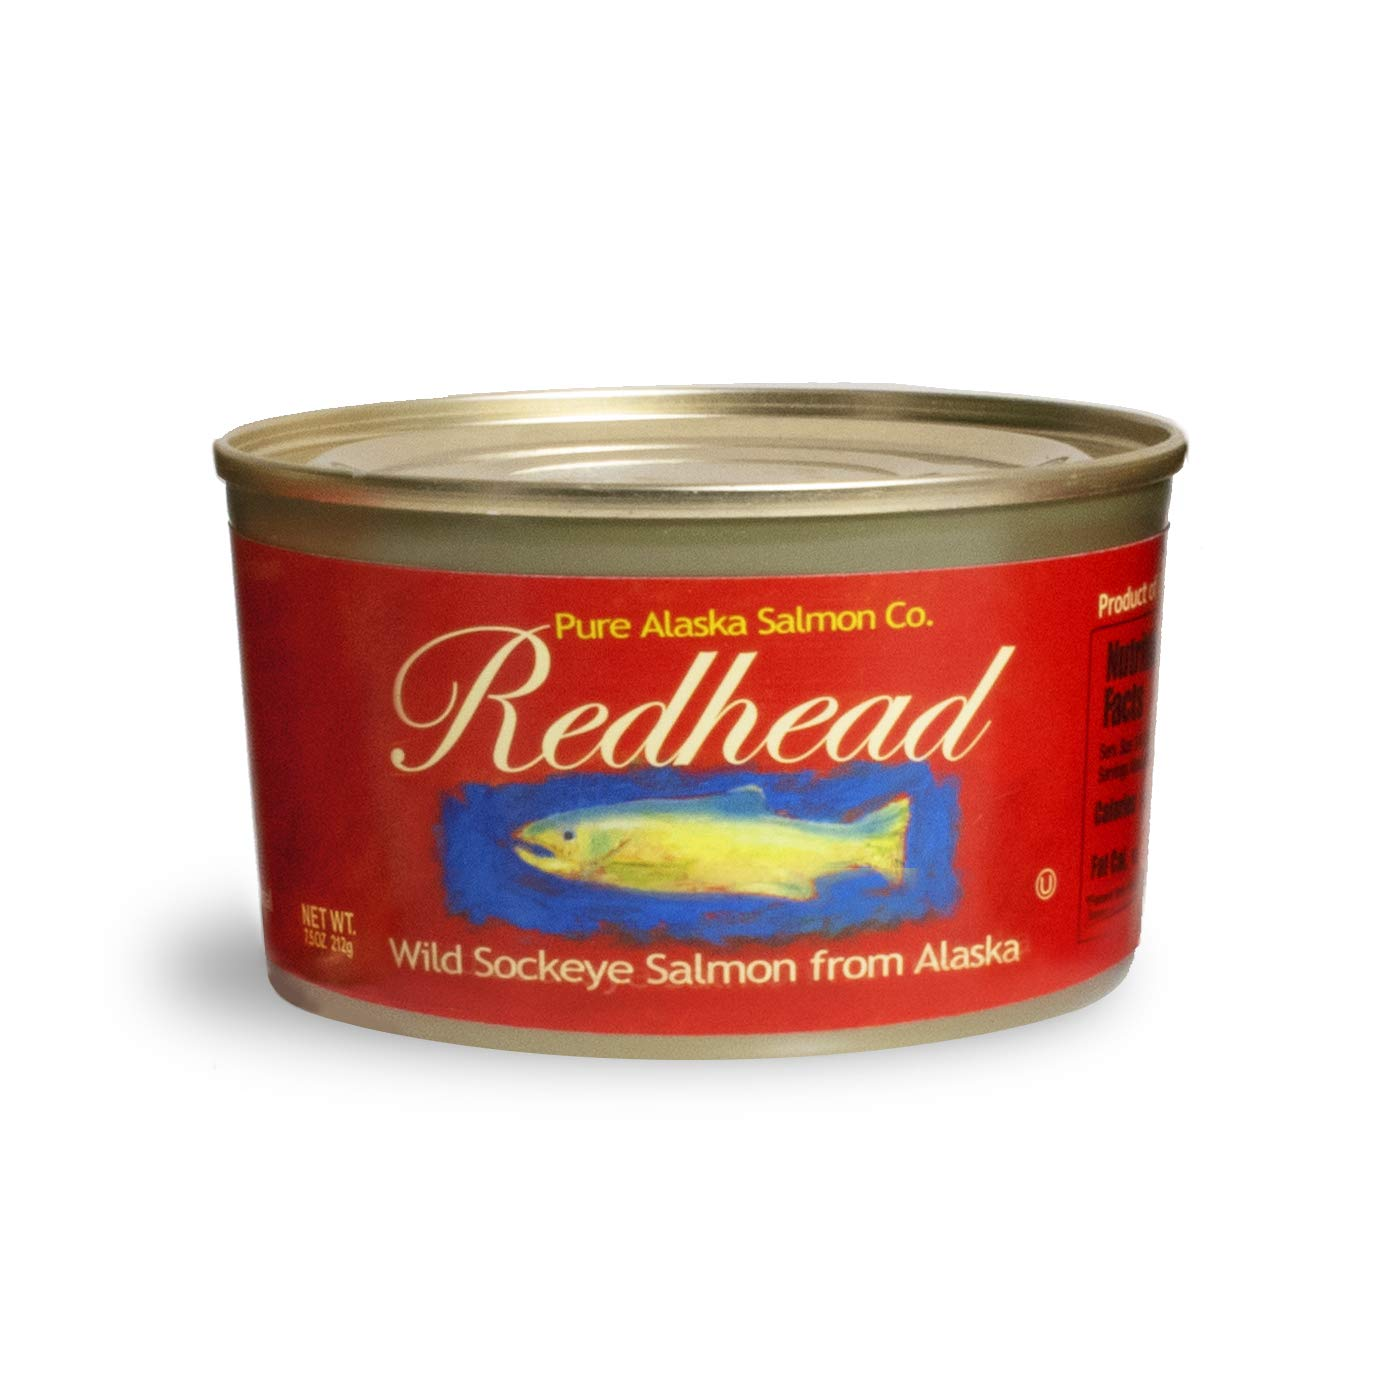 Redhead Wild Sockeye Salmon From Alaska, (12) 7.5 Oz. Cans